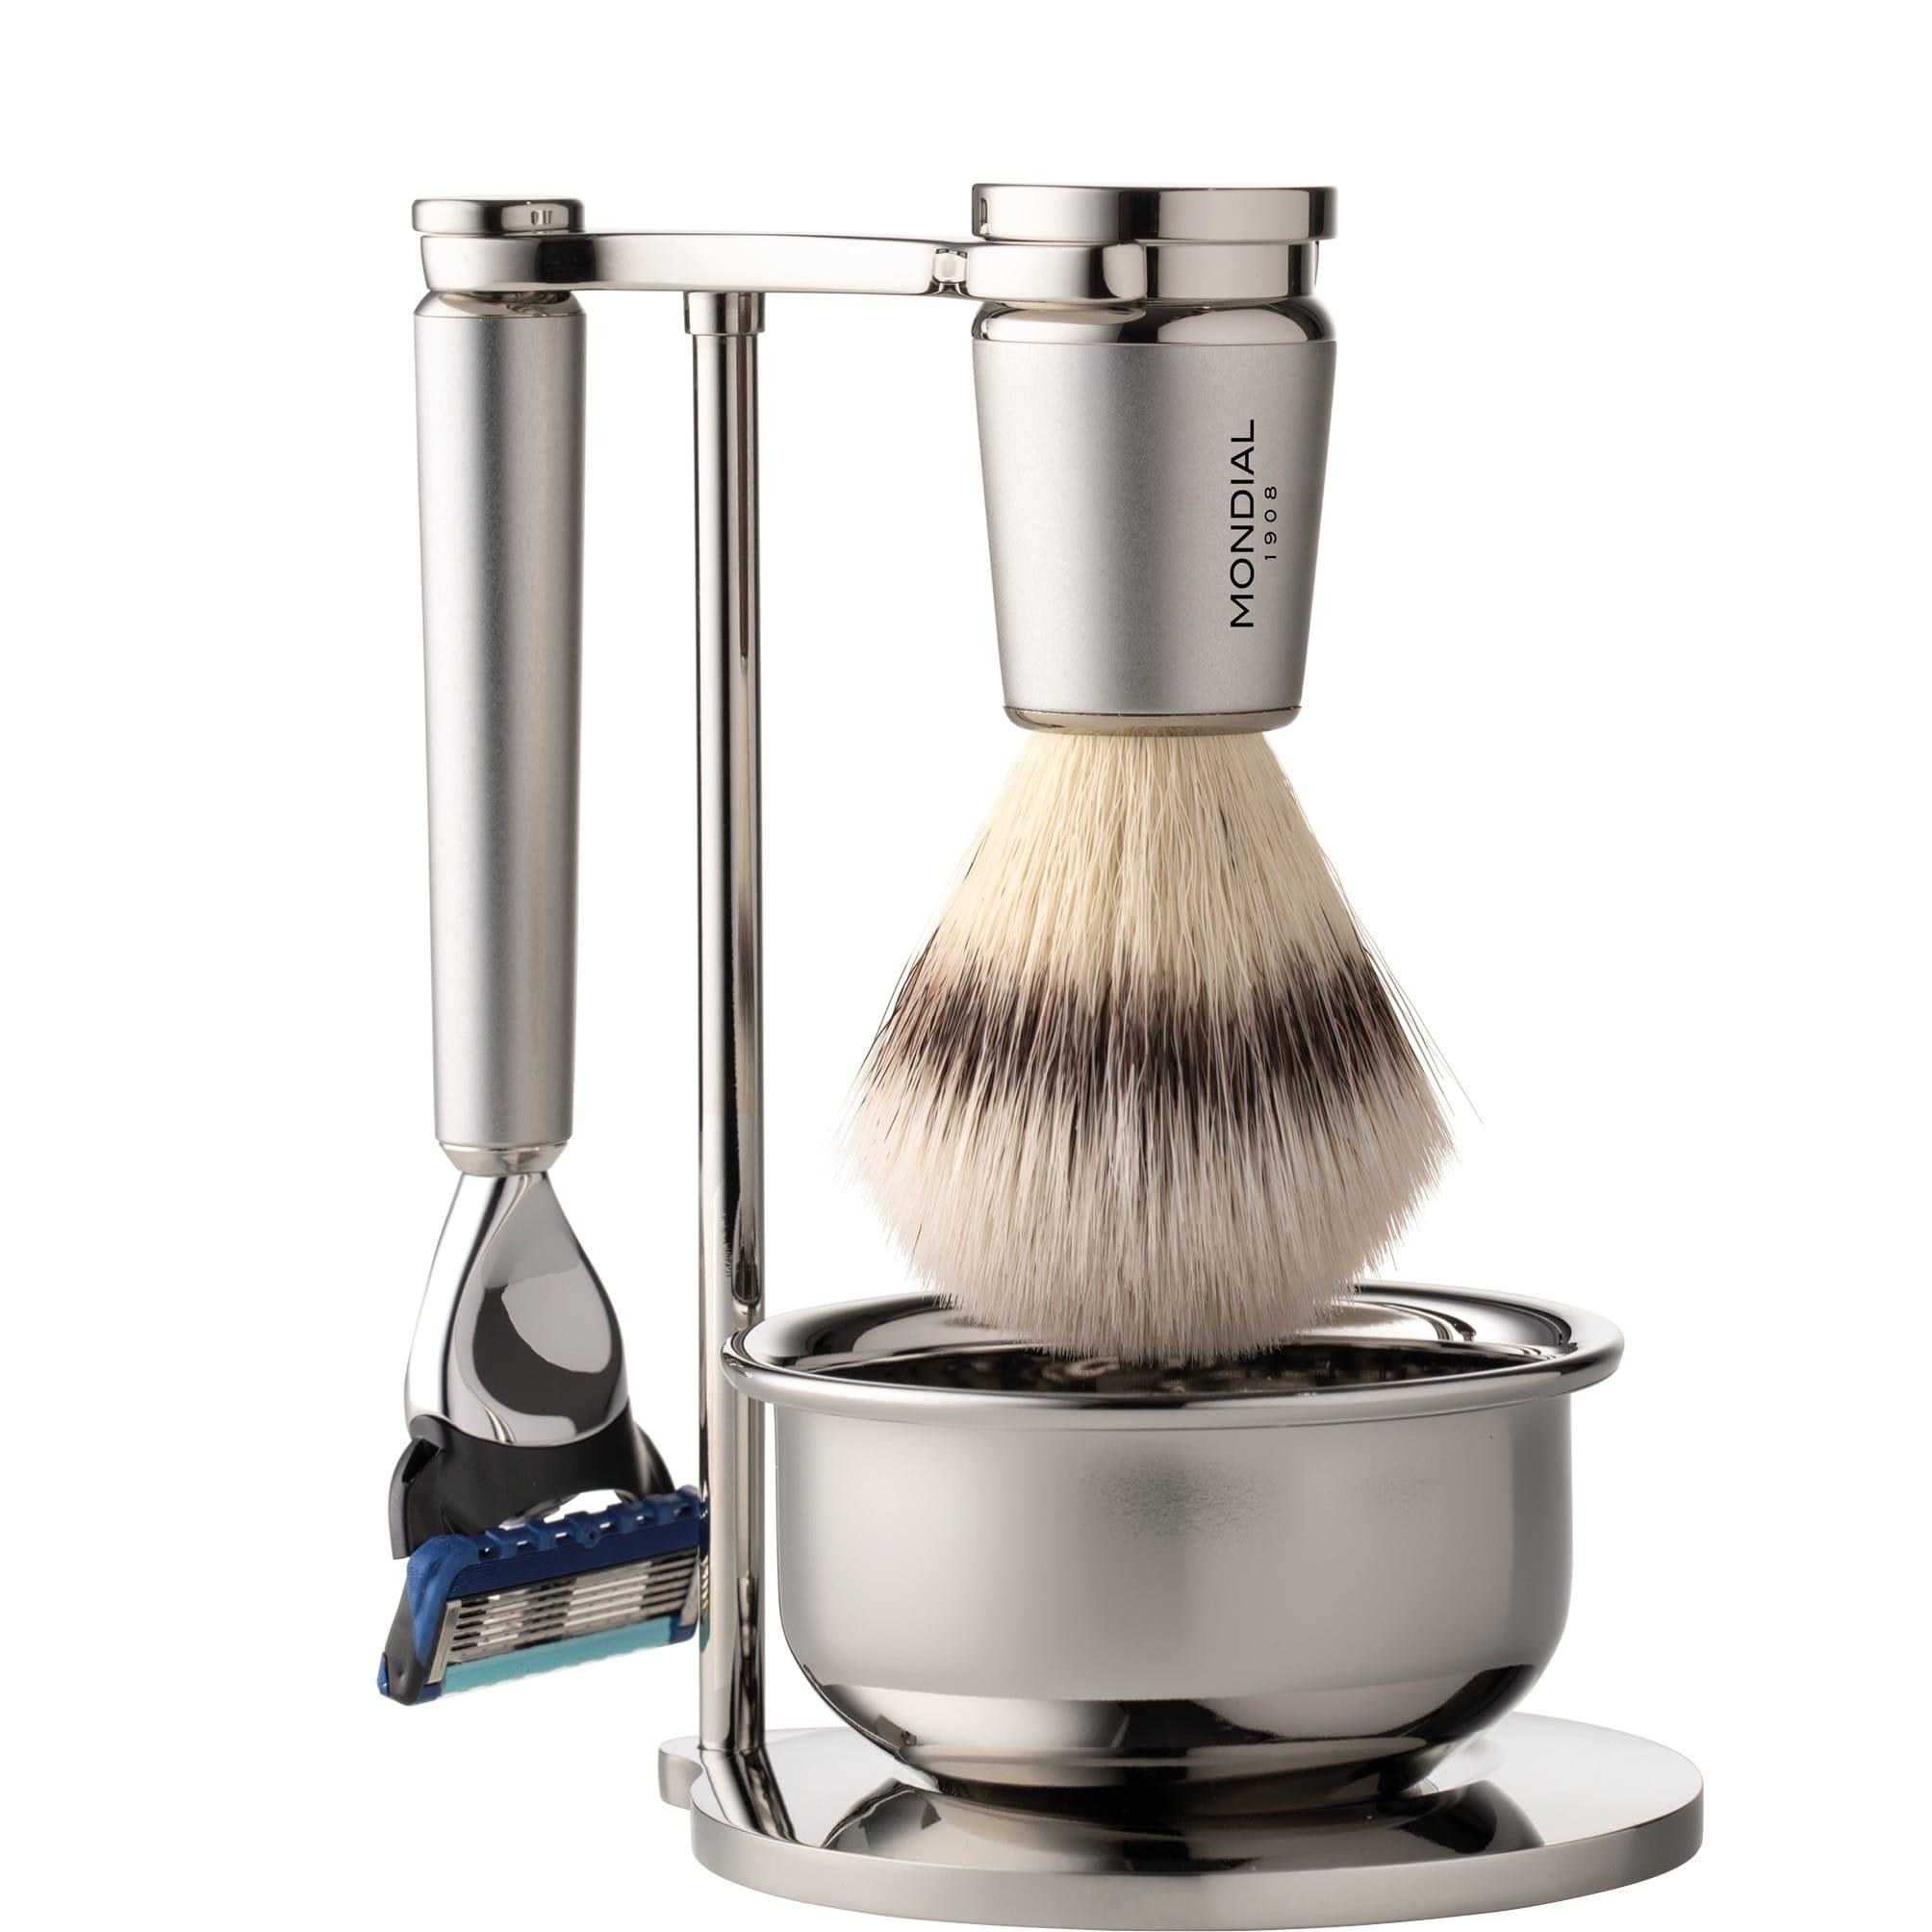 Scheerset & Bowl Run Fusion - Silvertip Fibre -  satin chroom